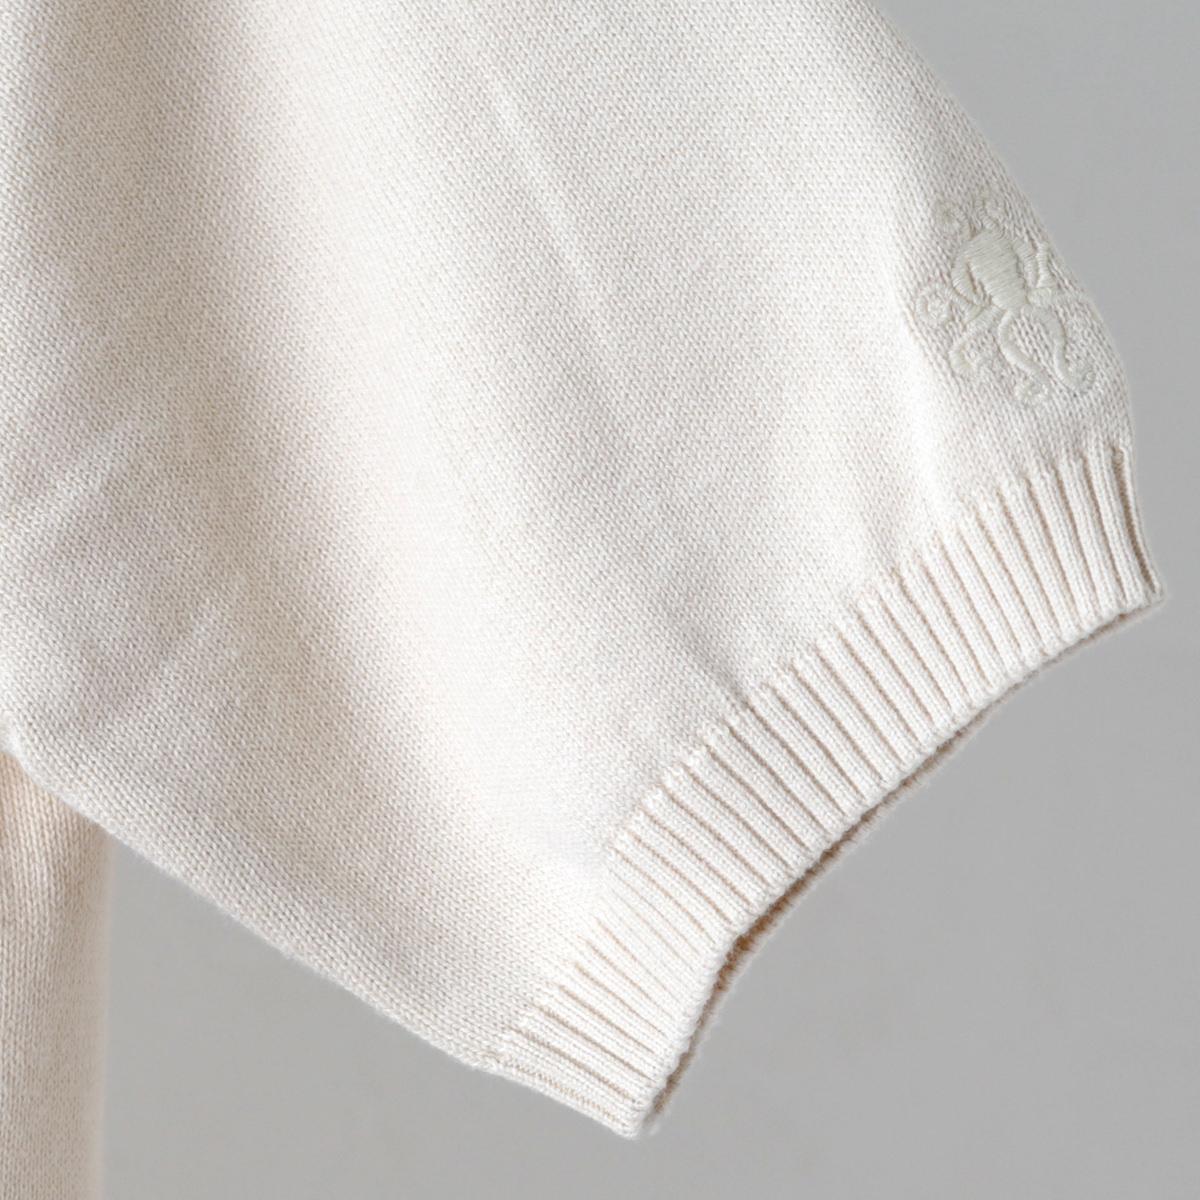 Madcap England メンズ ポロシャツ ニット ポロ ストライプ 2色 バーチ ブラック マッドキャップ